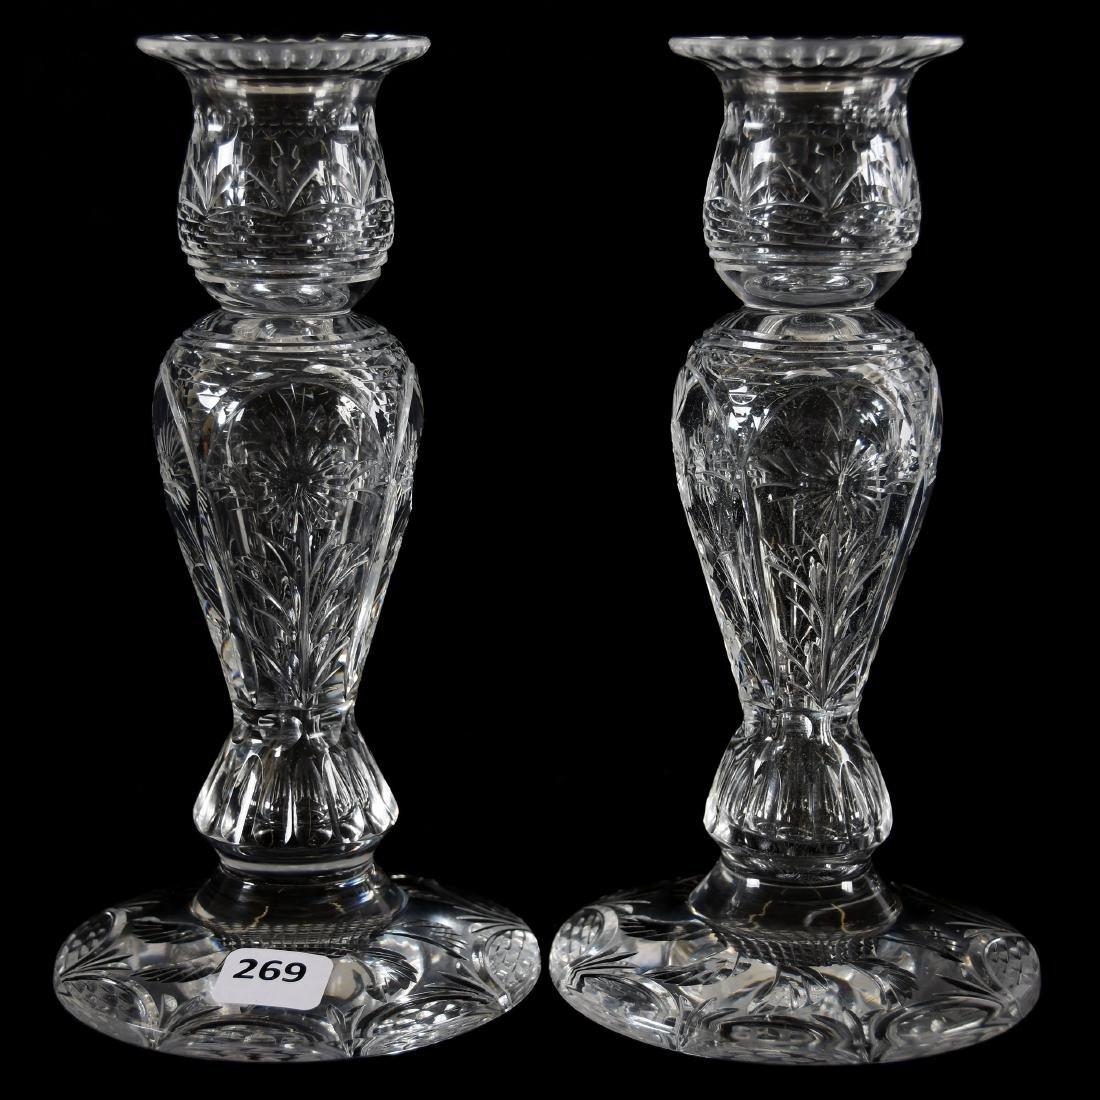 Pair Candlesticks, Engraved Floral Motif